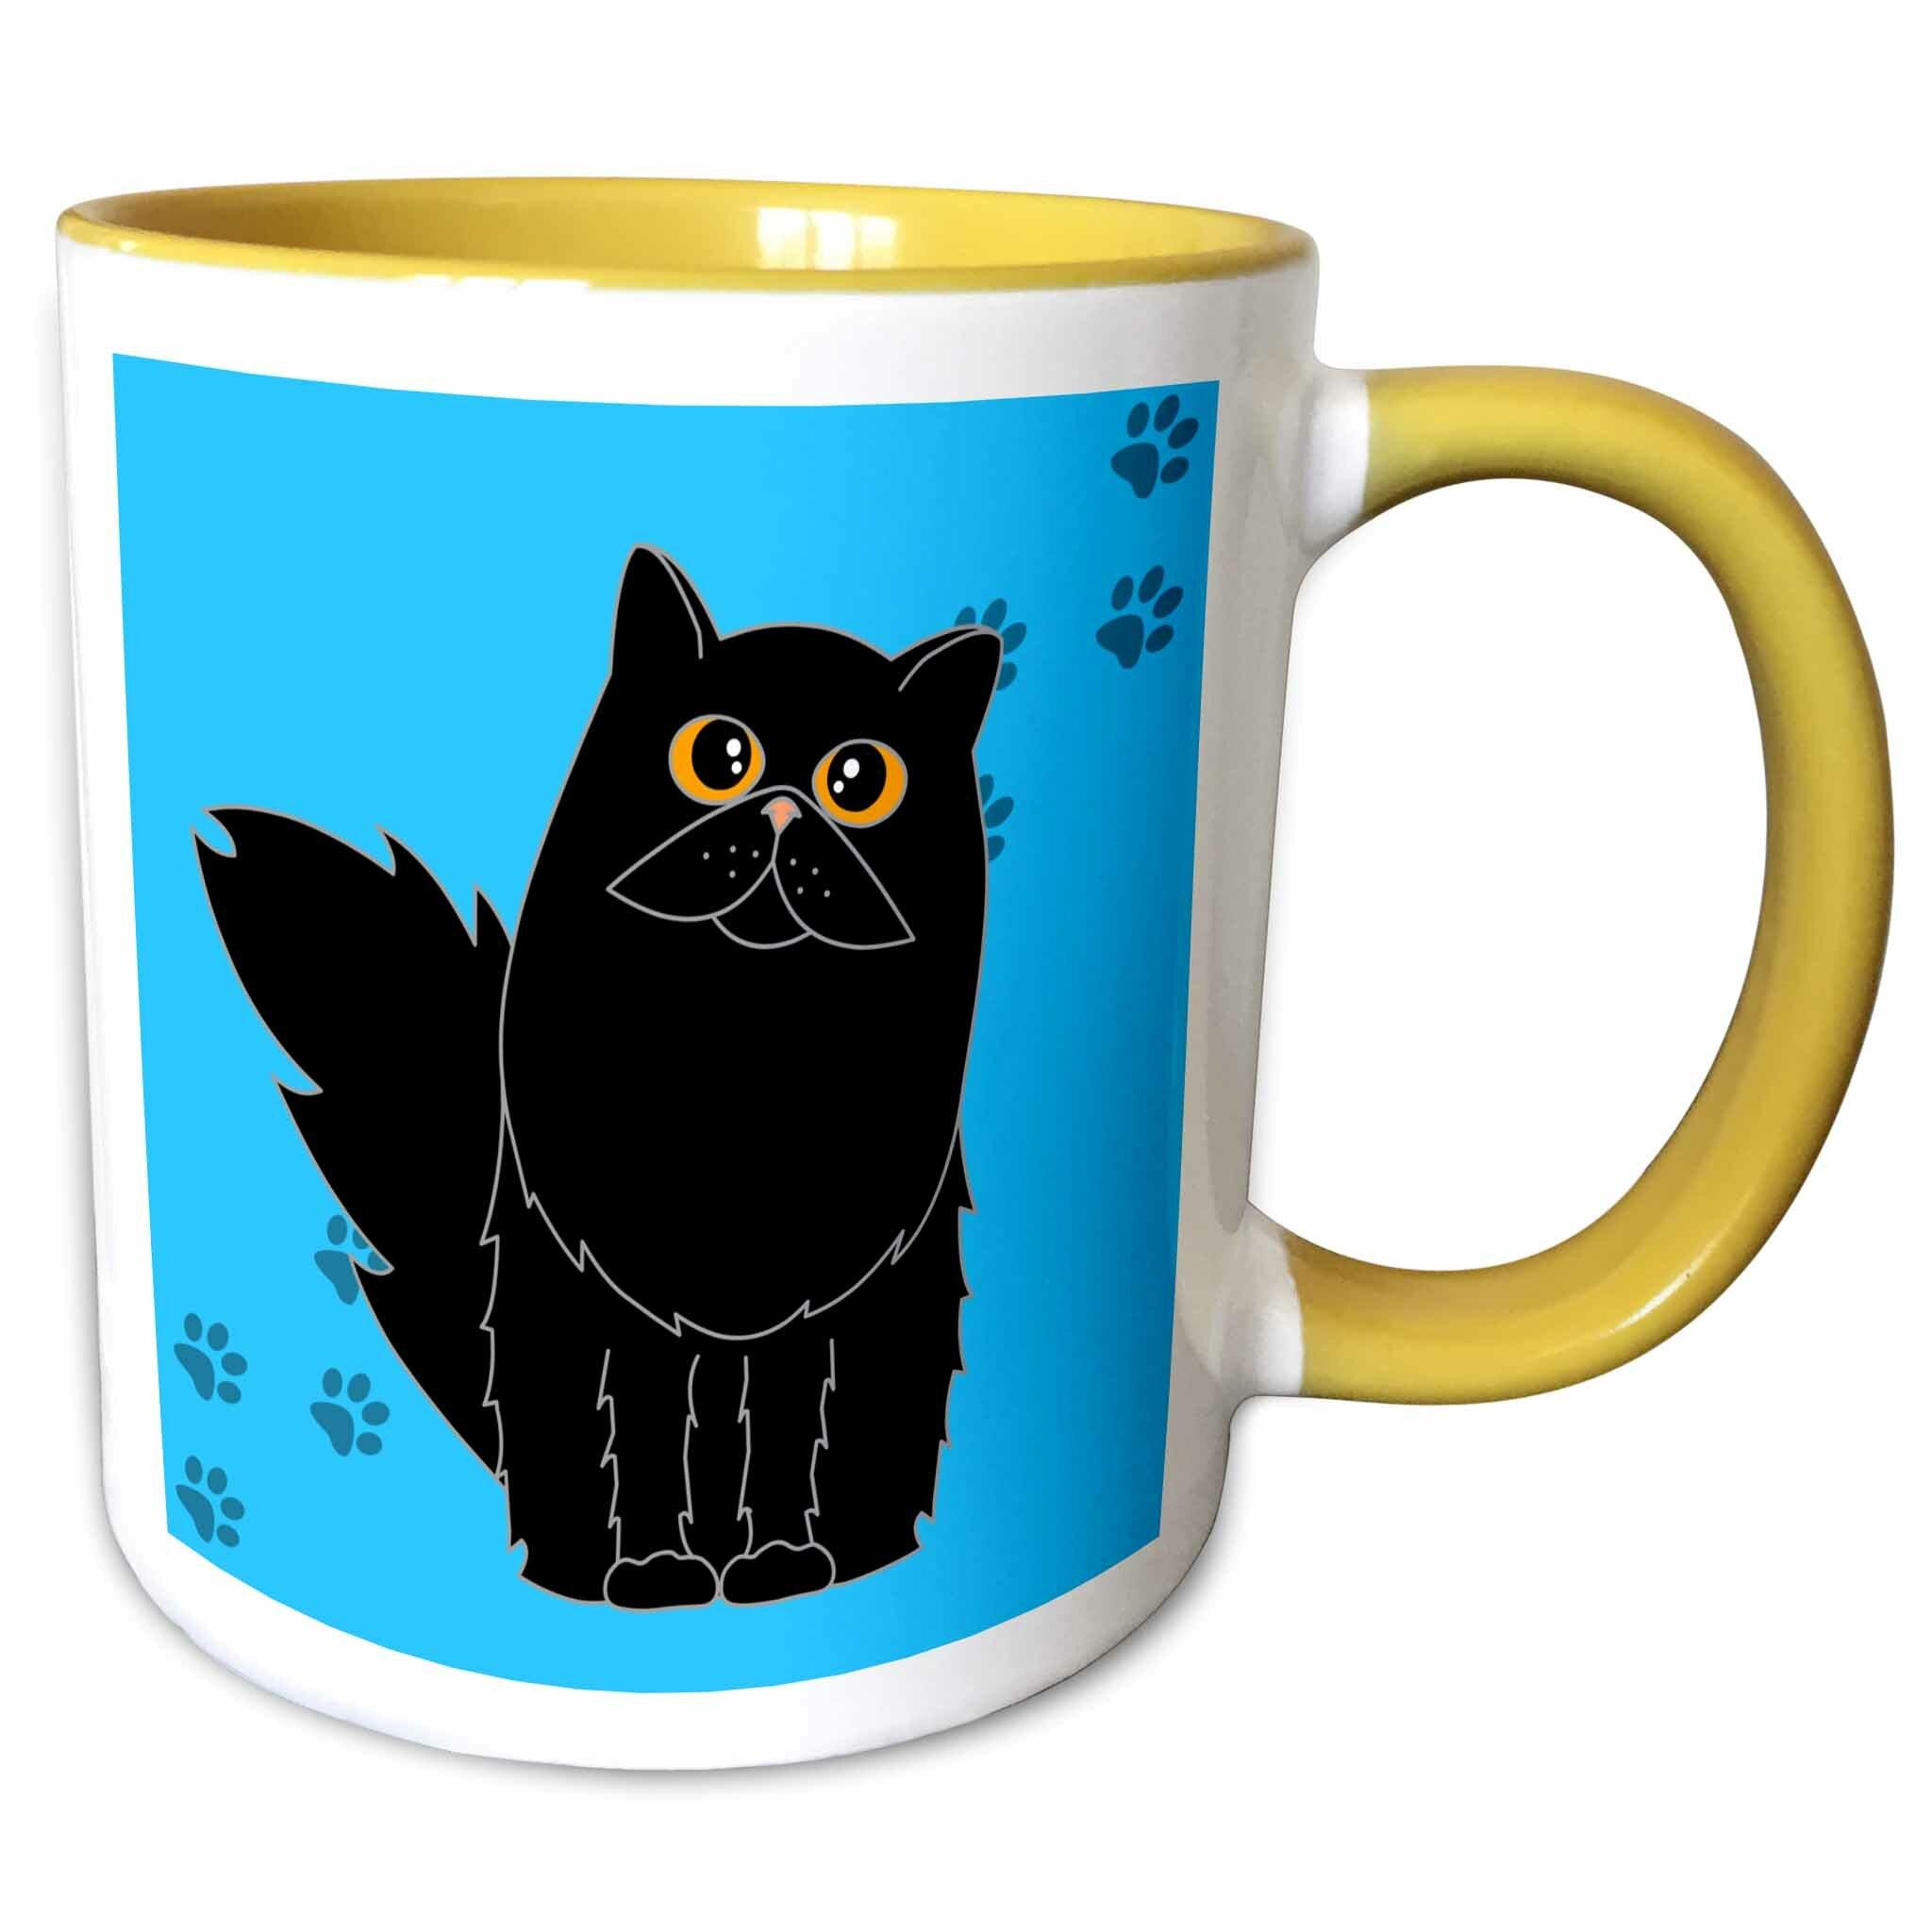 Symple Stuff Hoang Black Long Haired Persian Cat Paw Coffee Mug Wayfair